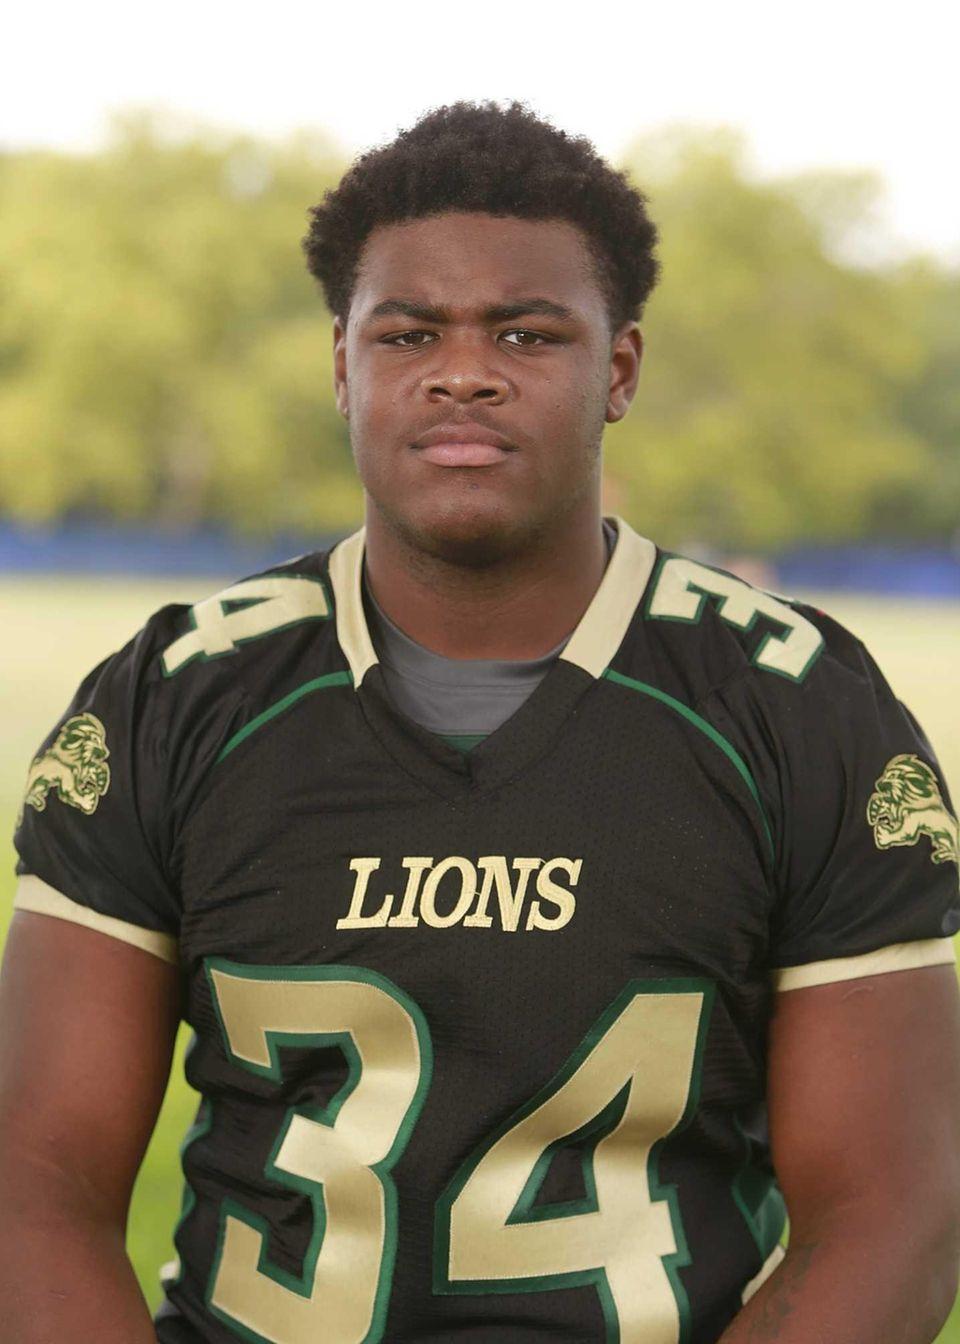 Longwood, senior Fullback/linebacker Latrell Horton will move to